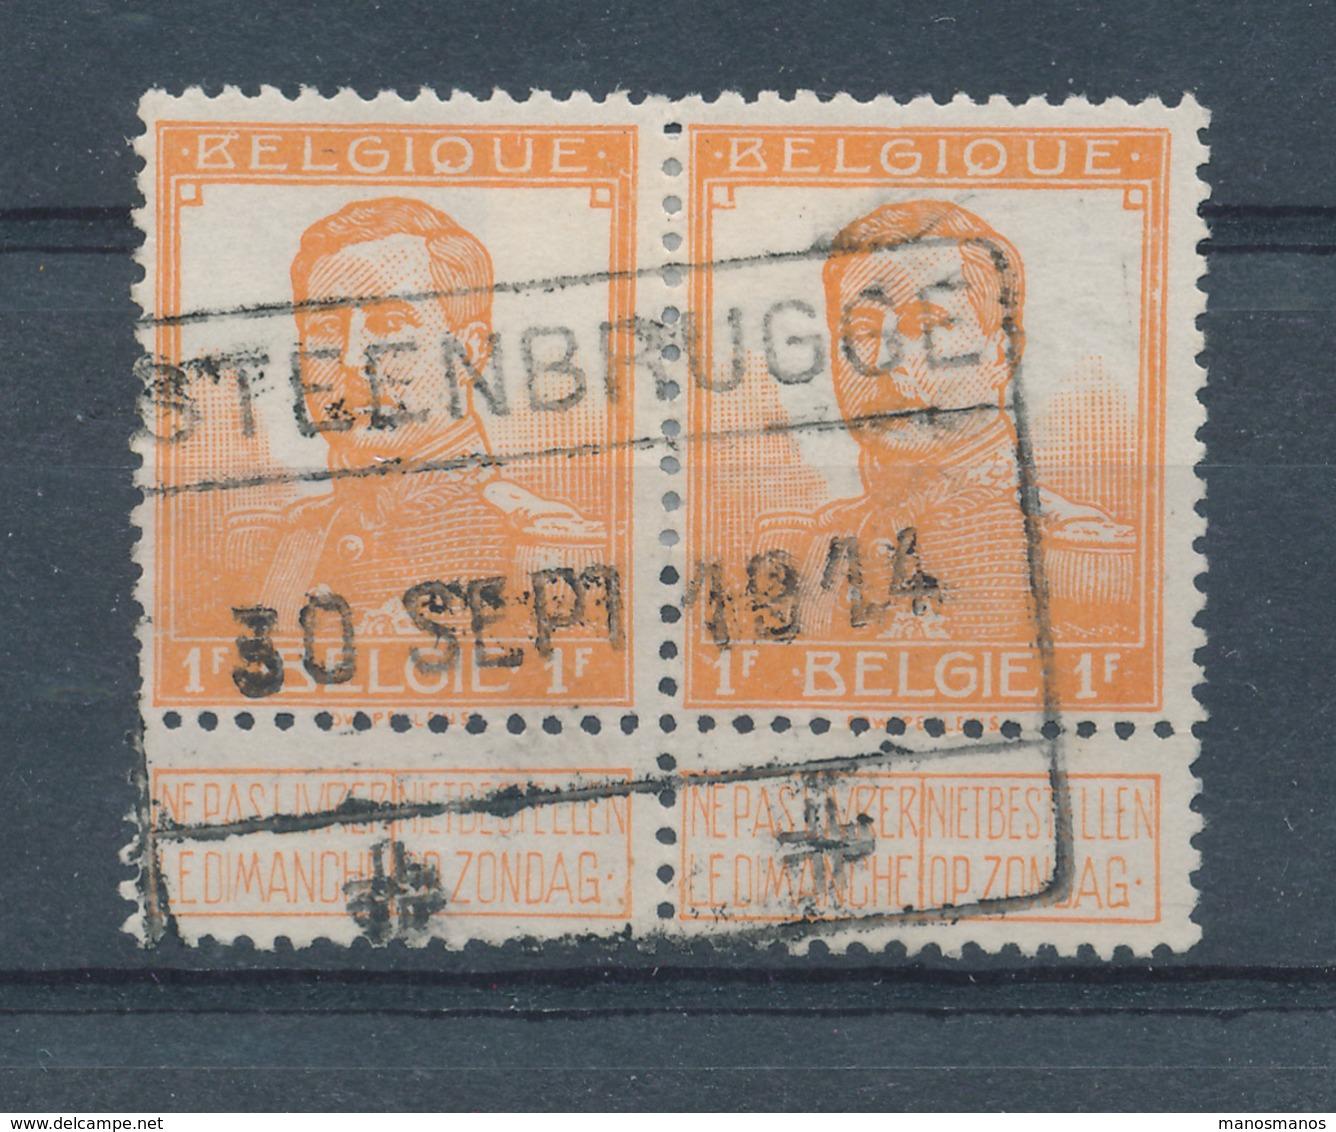 061/27 - Invasion Allemande - RARE Paire TP Pellens Cachet De Gare STEENBRUGGE 30 Sept. 1914 - Lijn BRUGGE / GENT - WW I